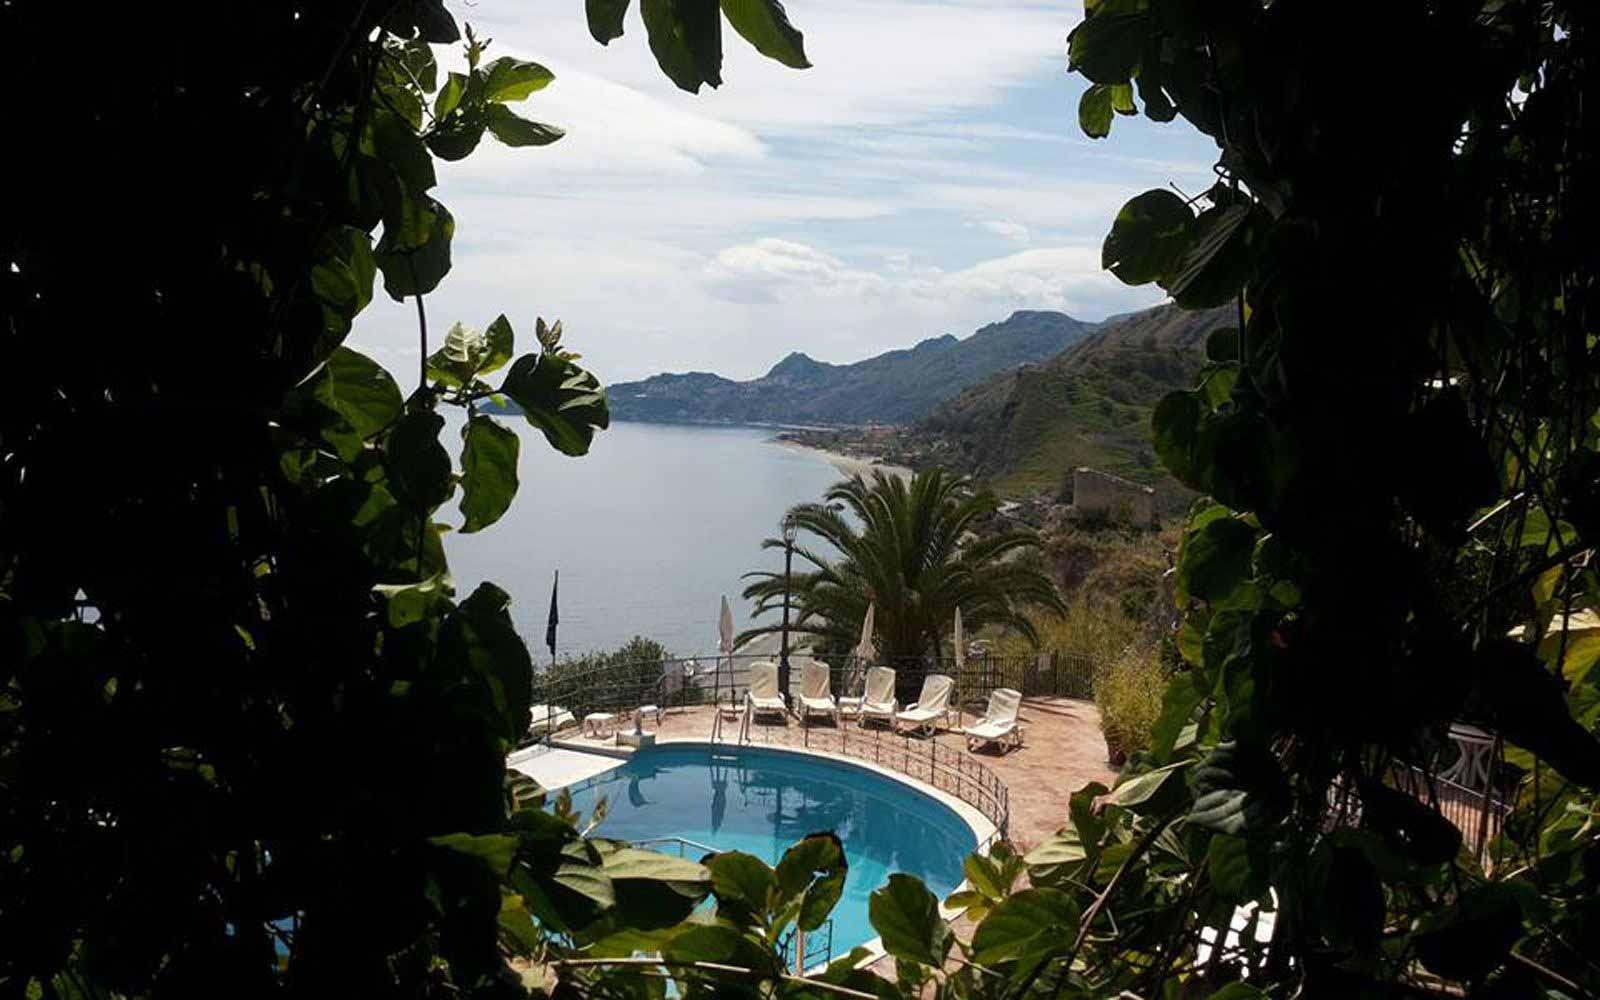 Pool with view over the bay of Taormina at Hotel Baia Taormina